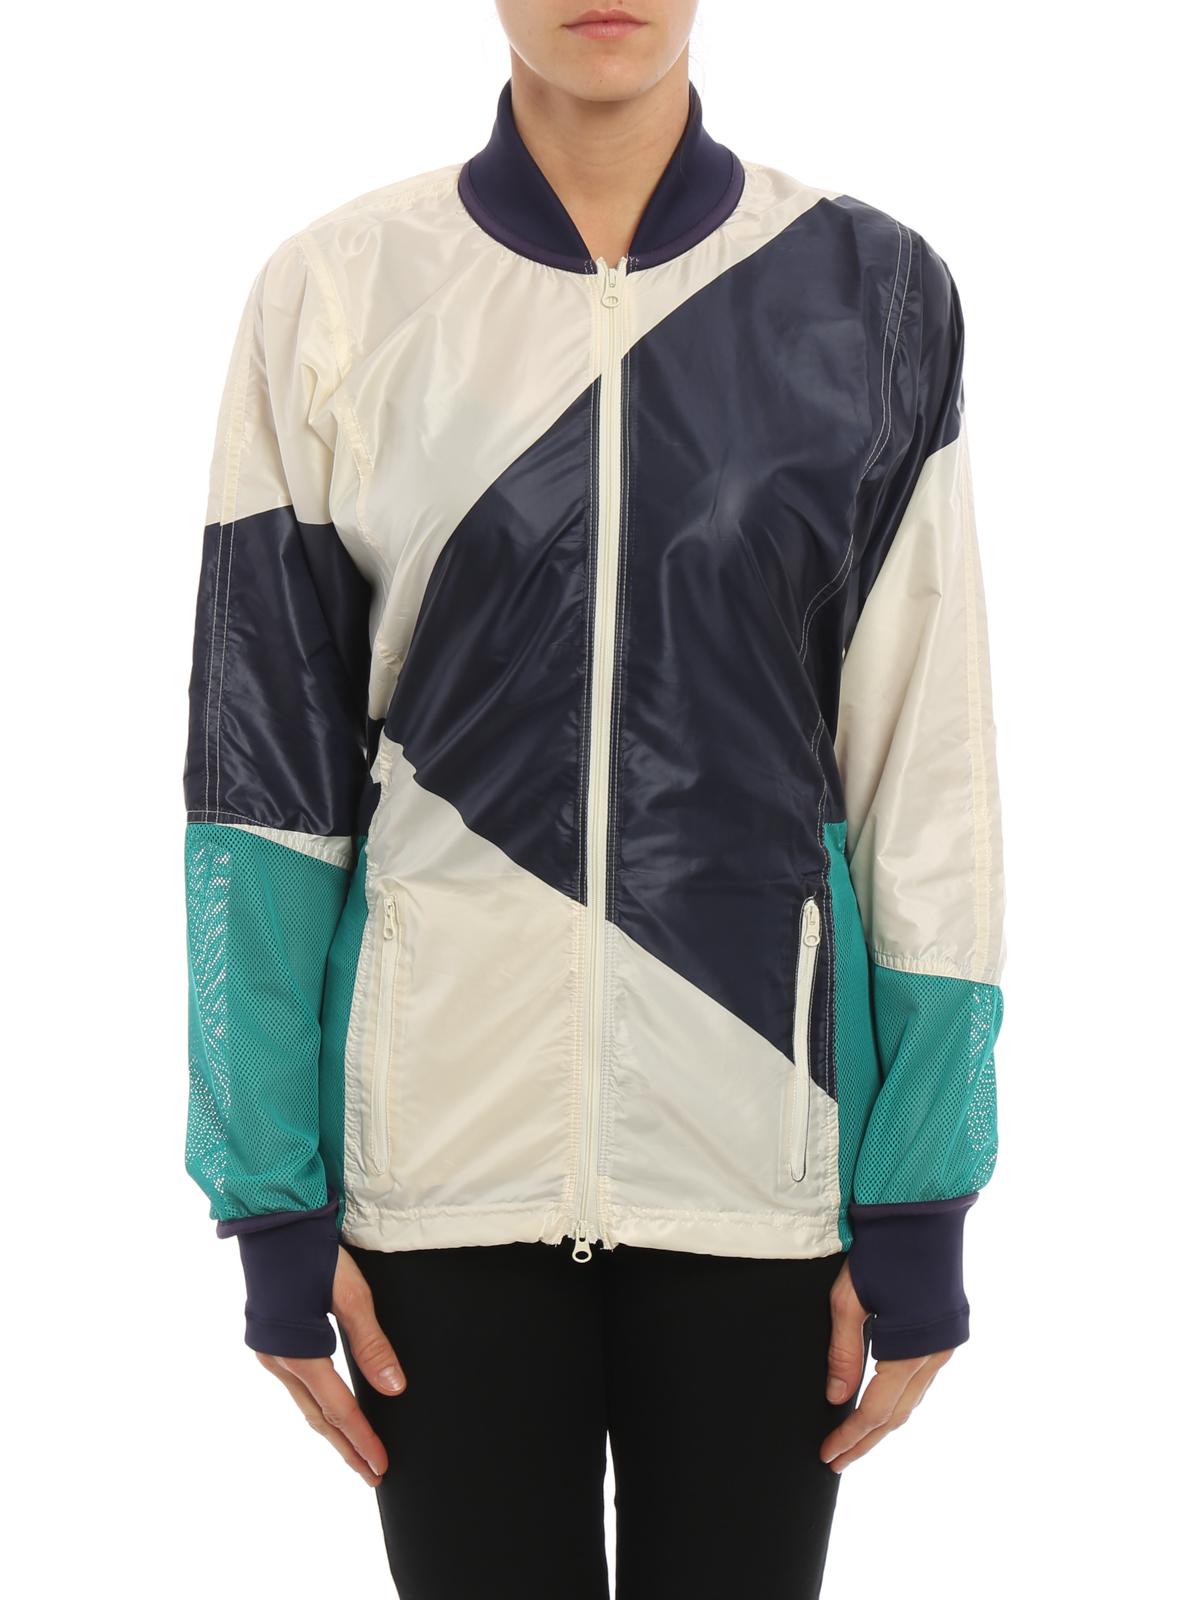 8459416757 ADIDAS BY STELLA MCCARTNEY  casual jackets online - Run Kite running jacket